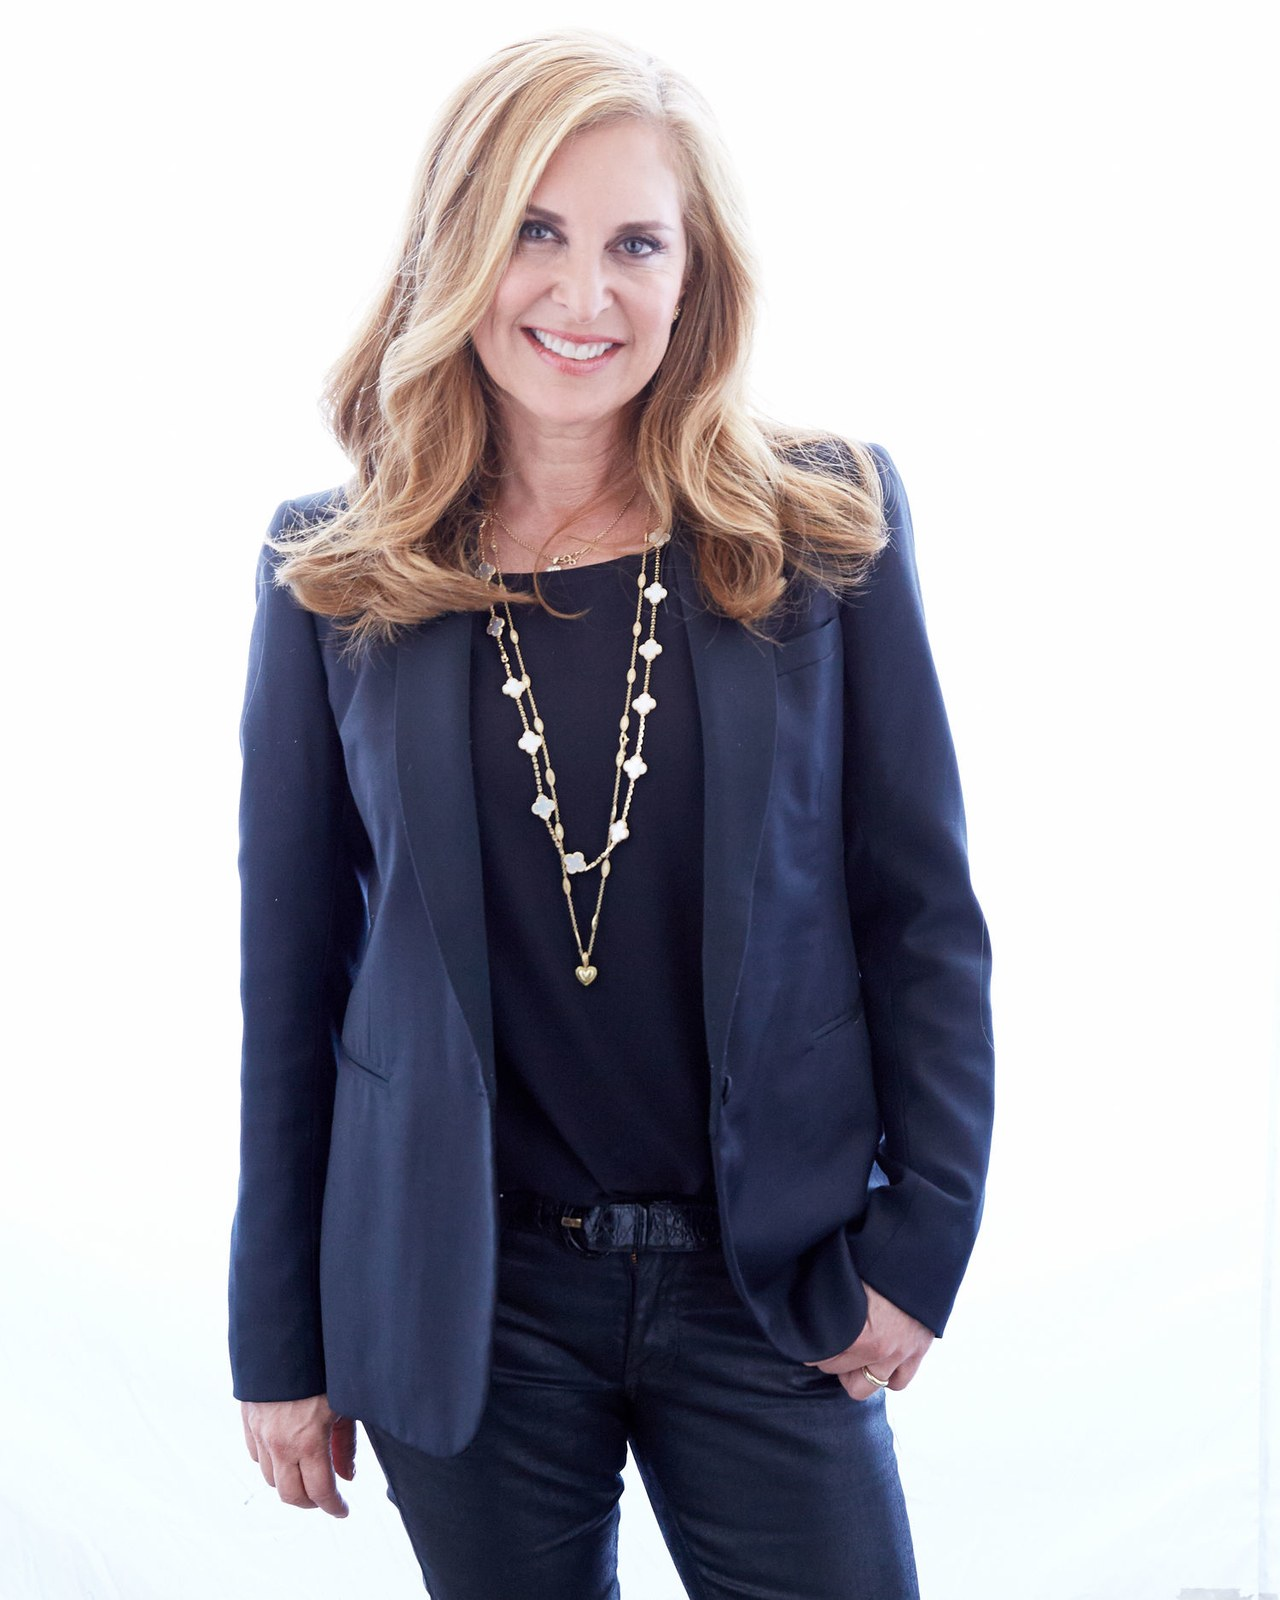 Susan Feldman  – Co-Founder, One Kings Lane